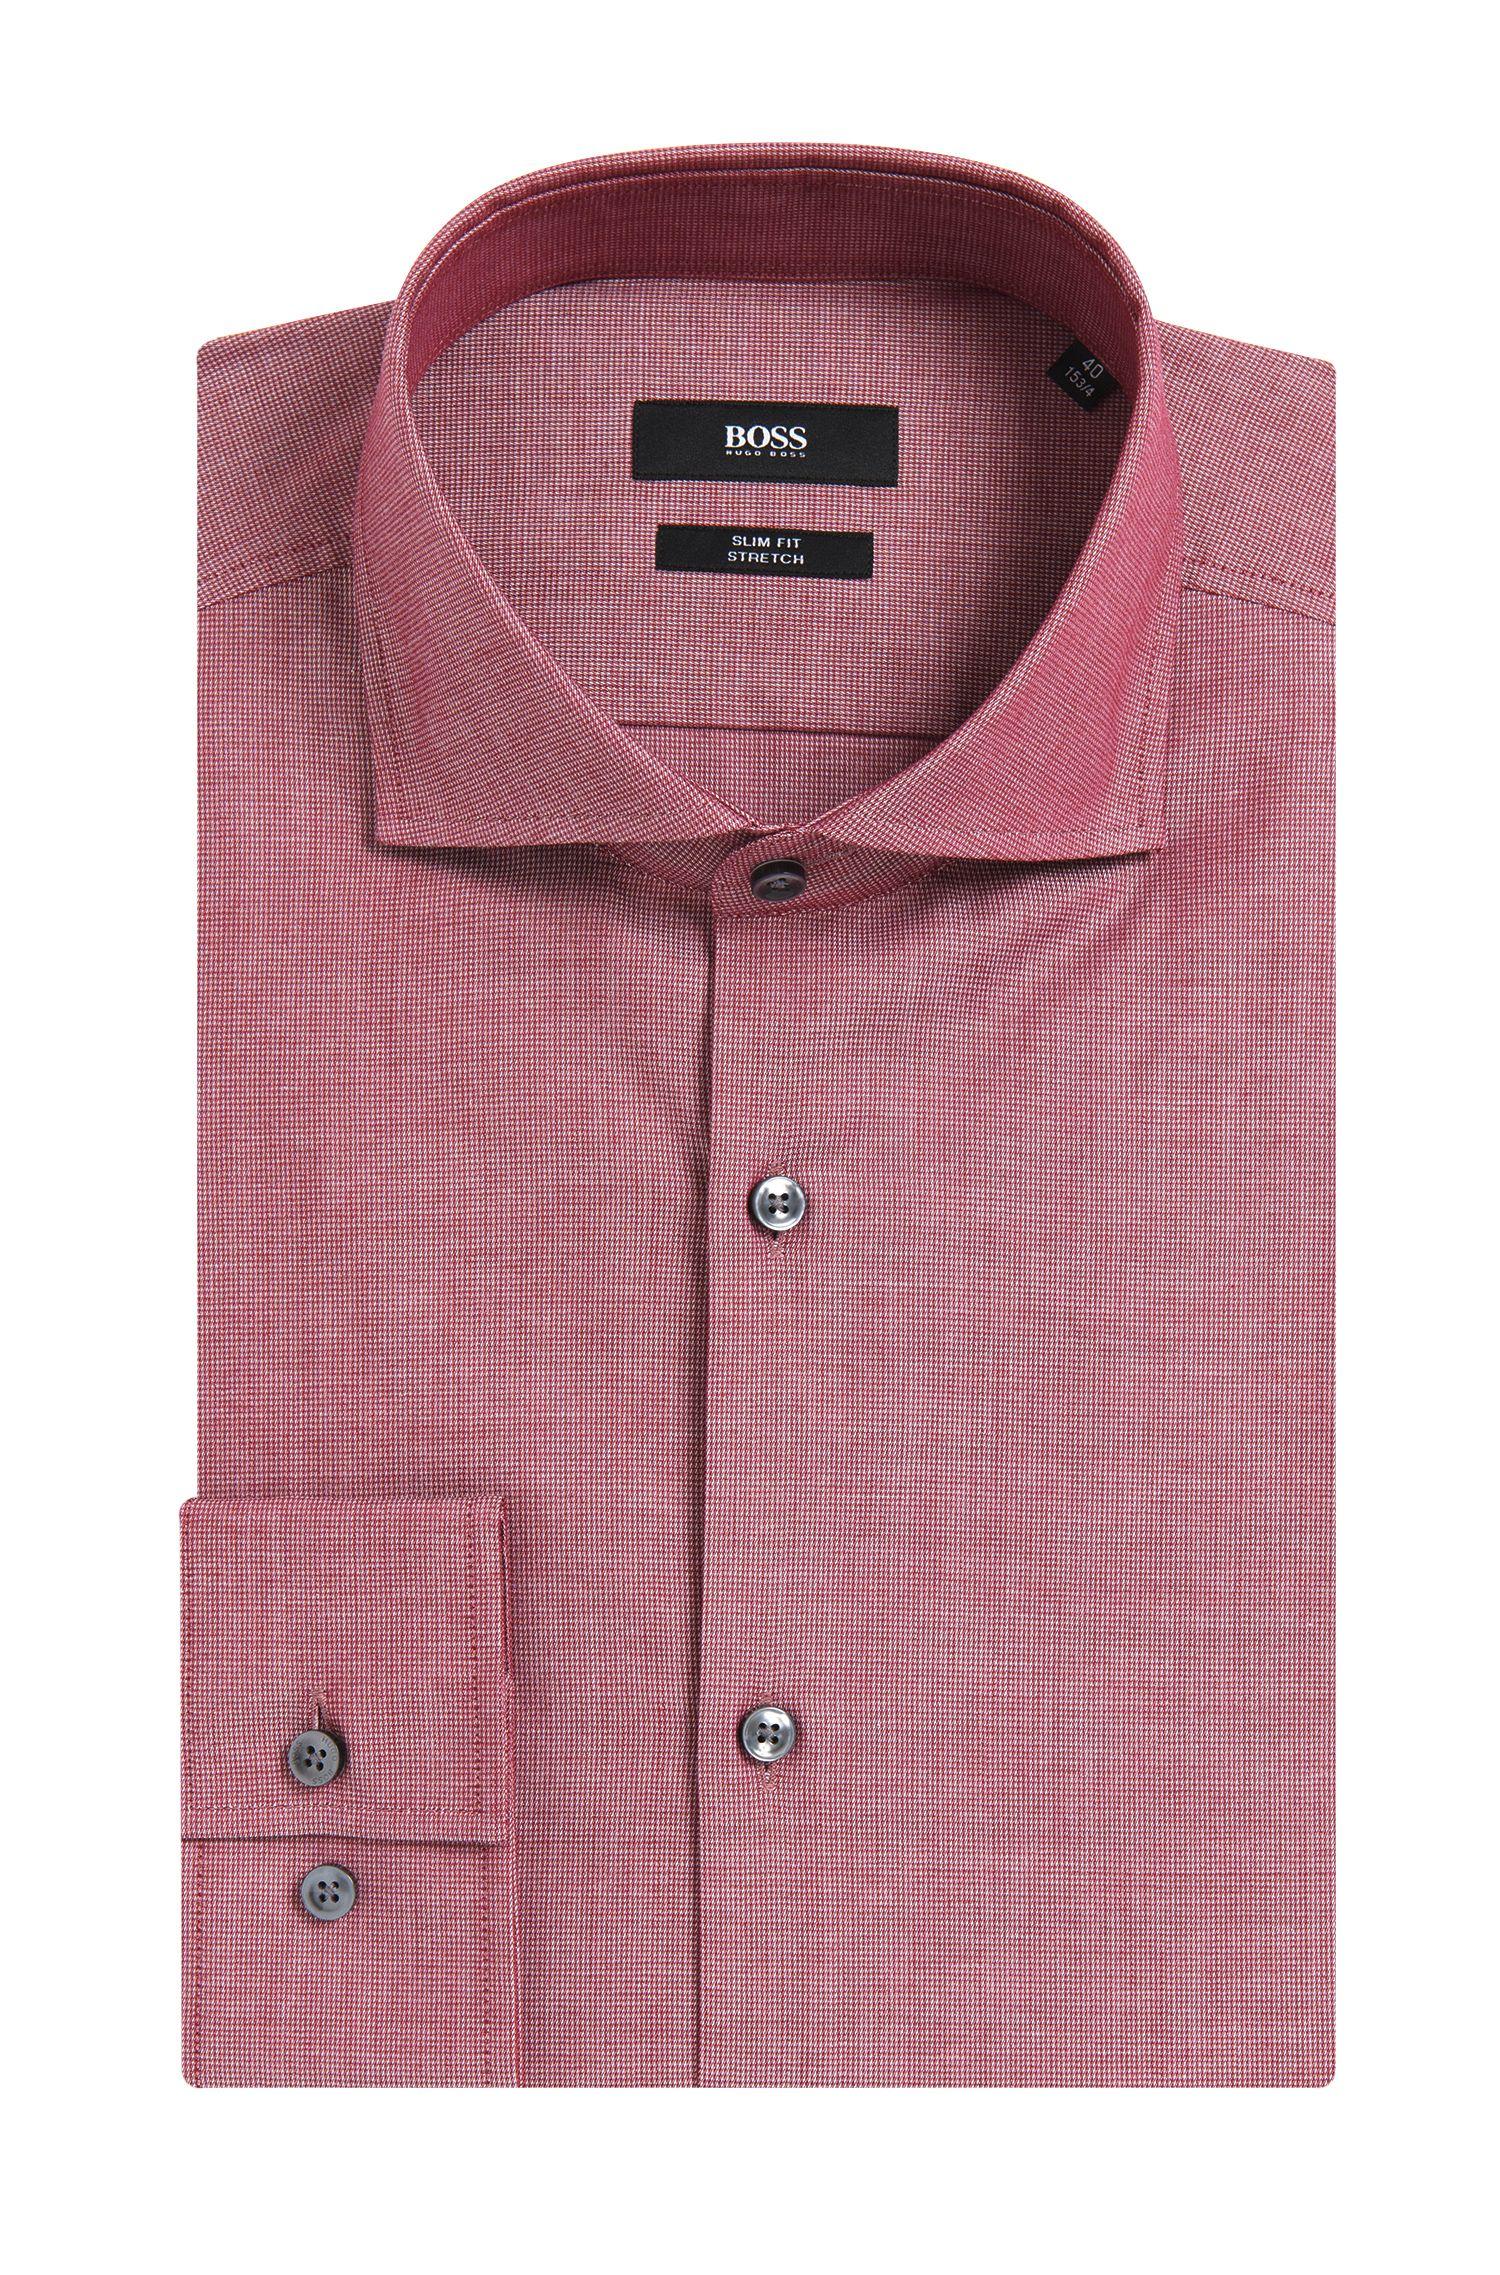 'Jason' | Slim Fit, Stretch Cotton Dress Shirt